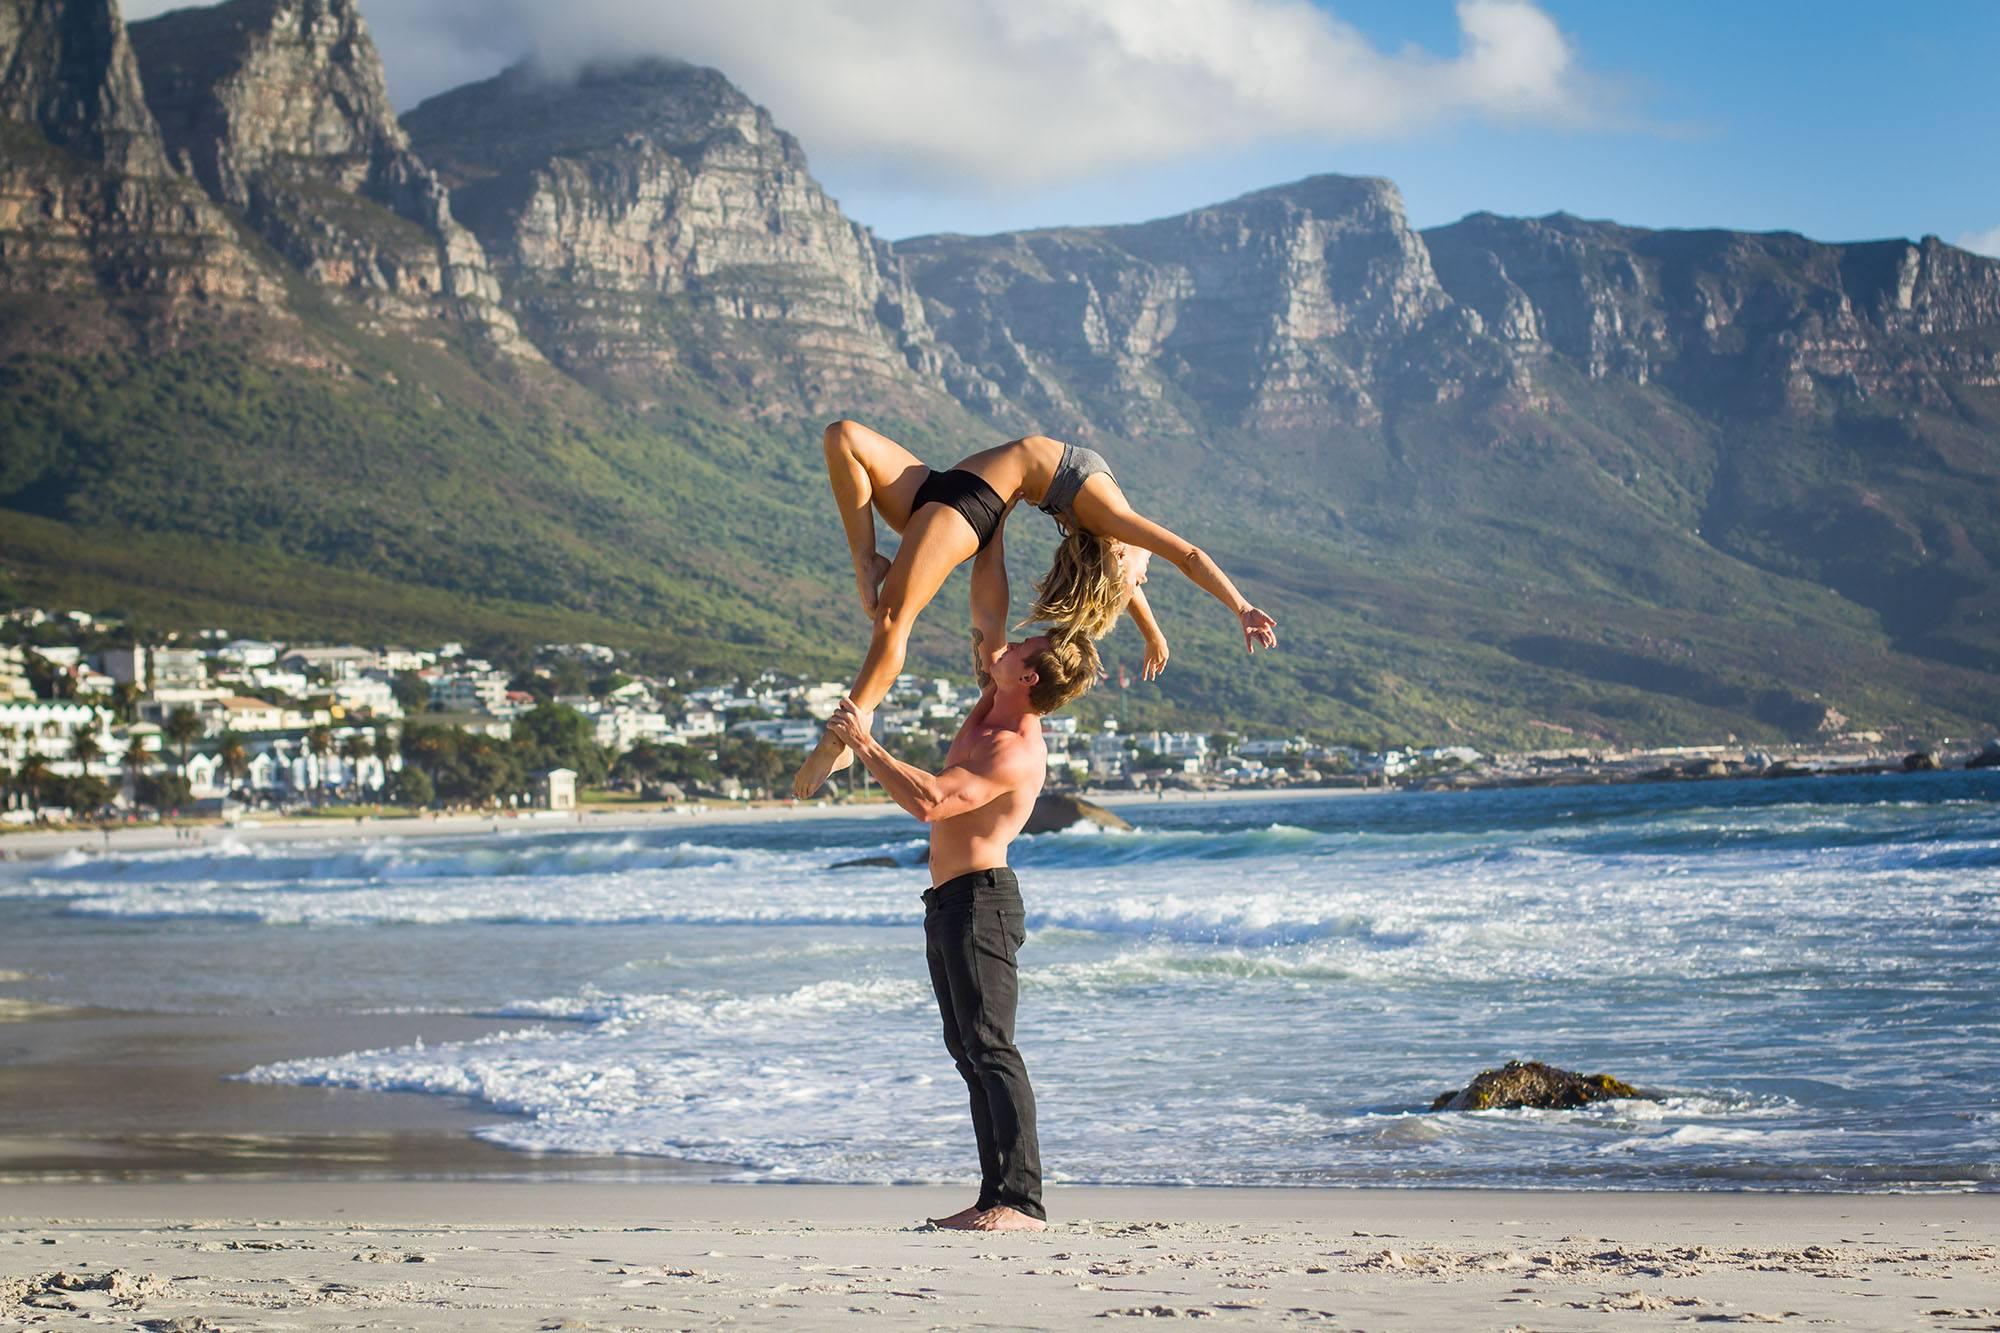 Nicole and James soaring on Glen beach, Cape Town (Amanda Webb)